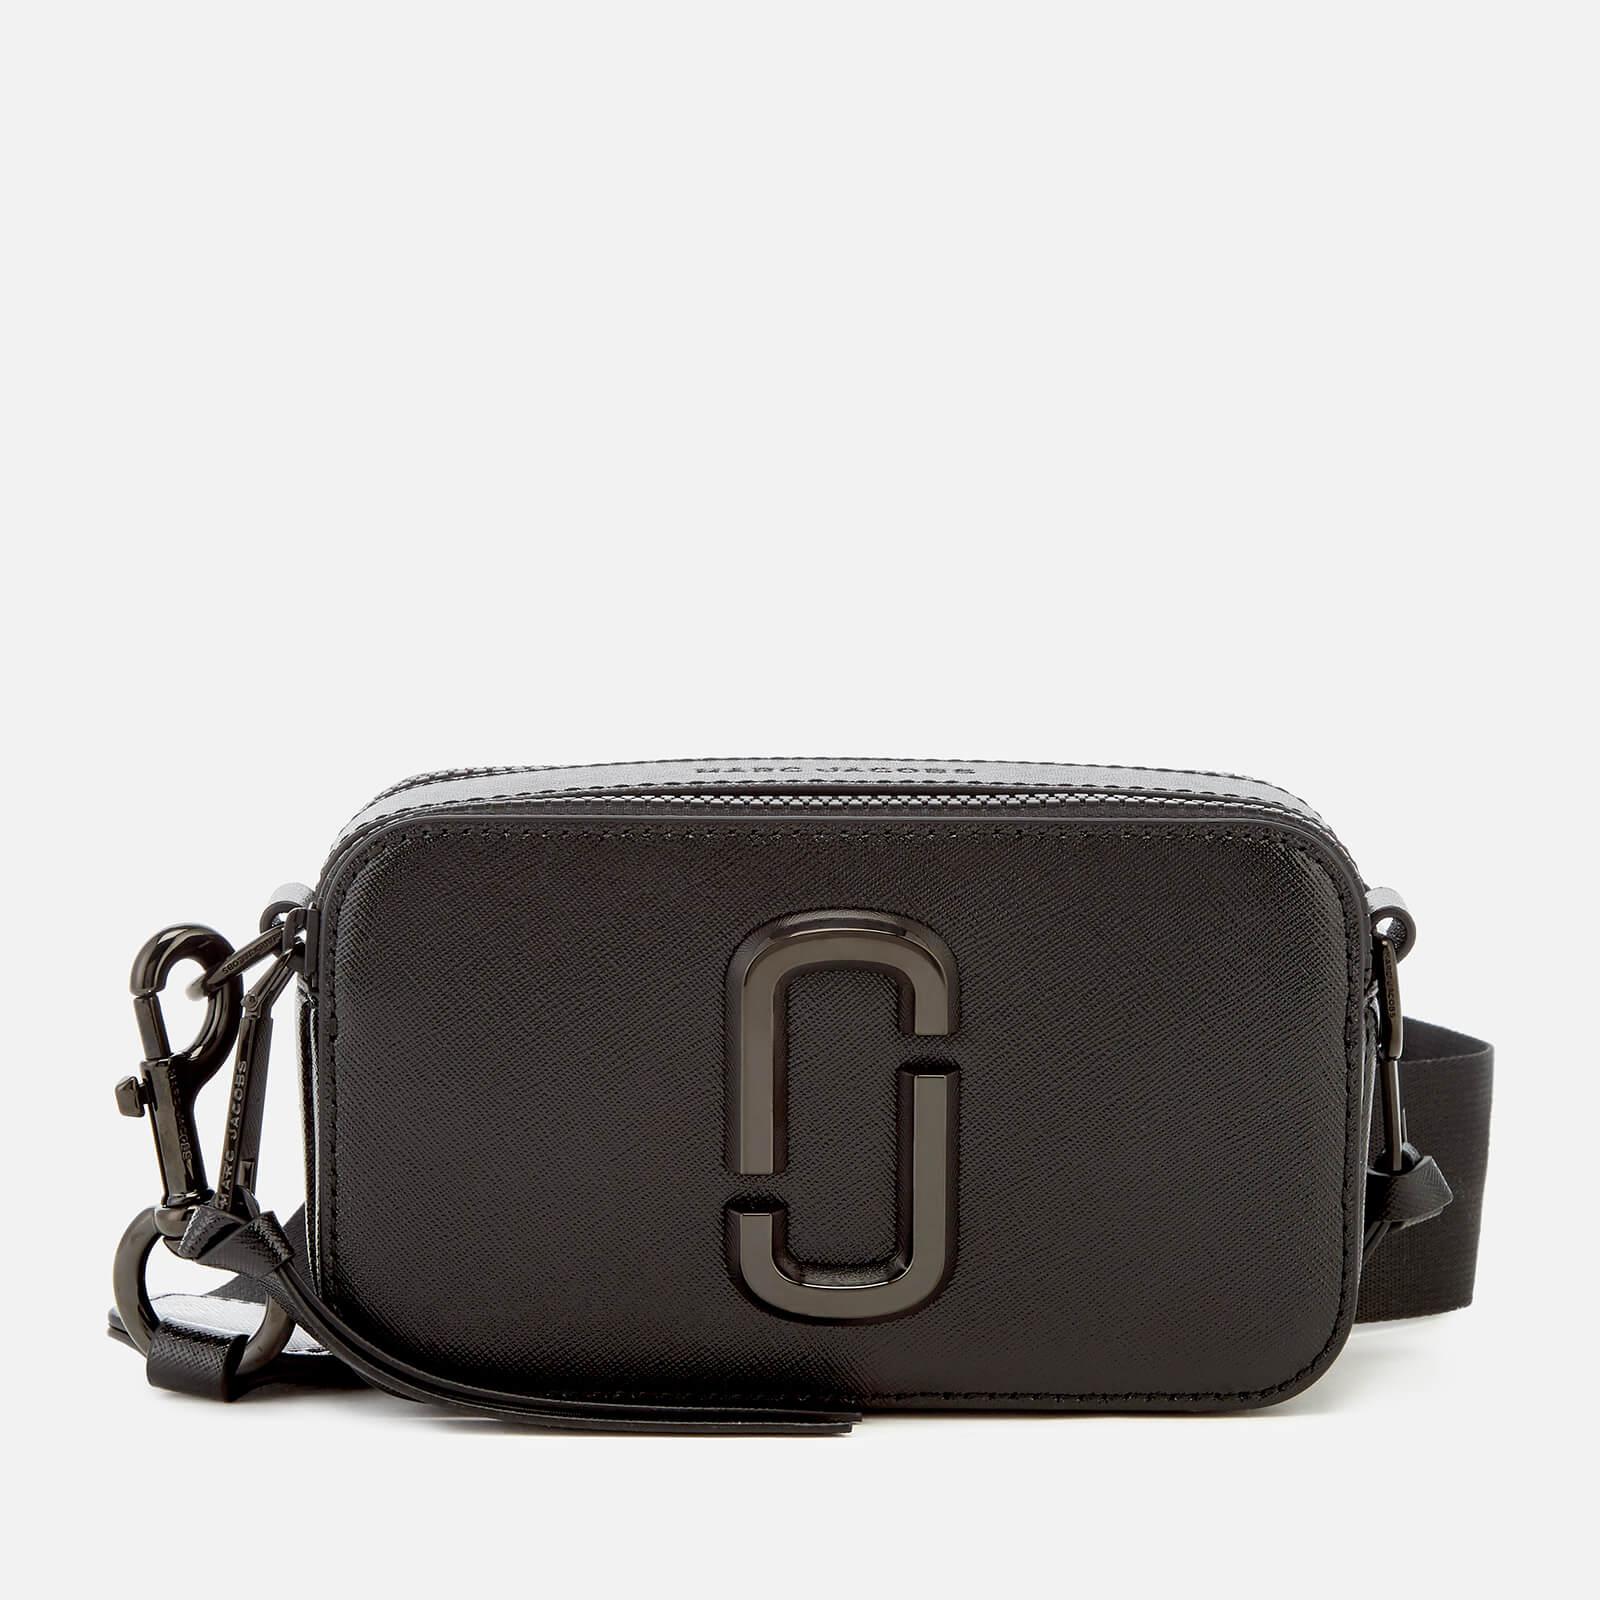 Marc Jacobs Women's Snapshot DTM Bag - Black